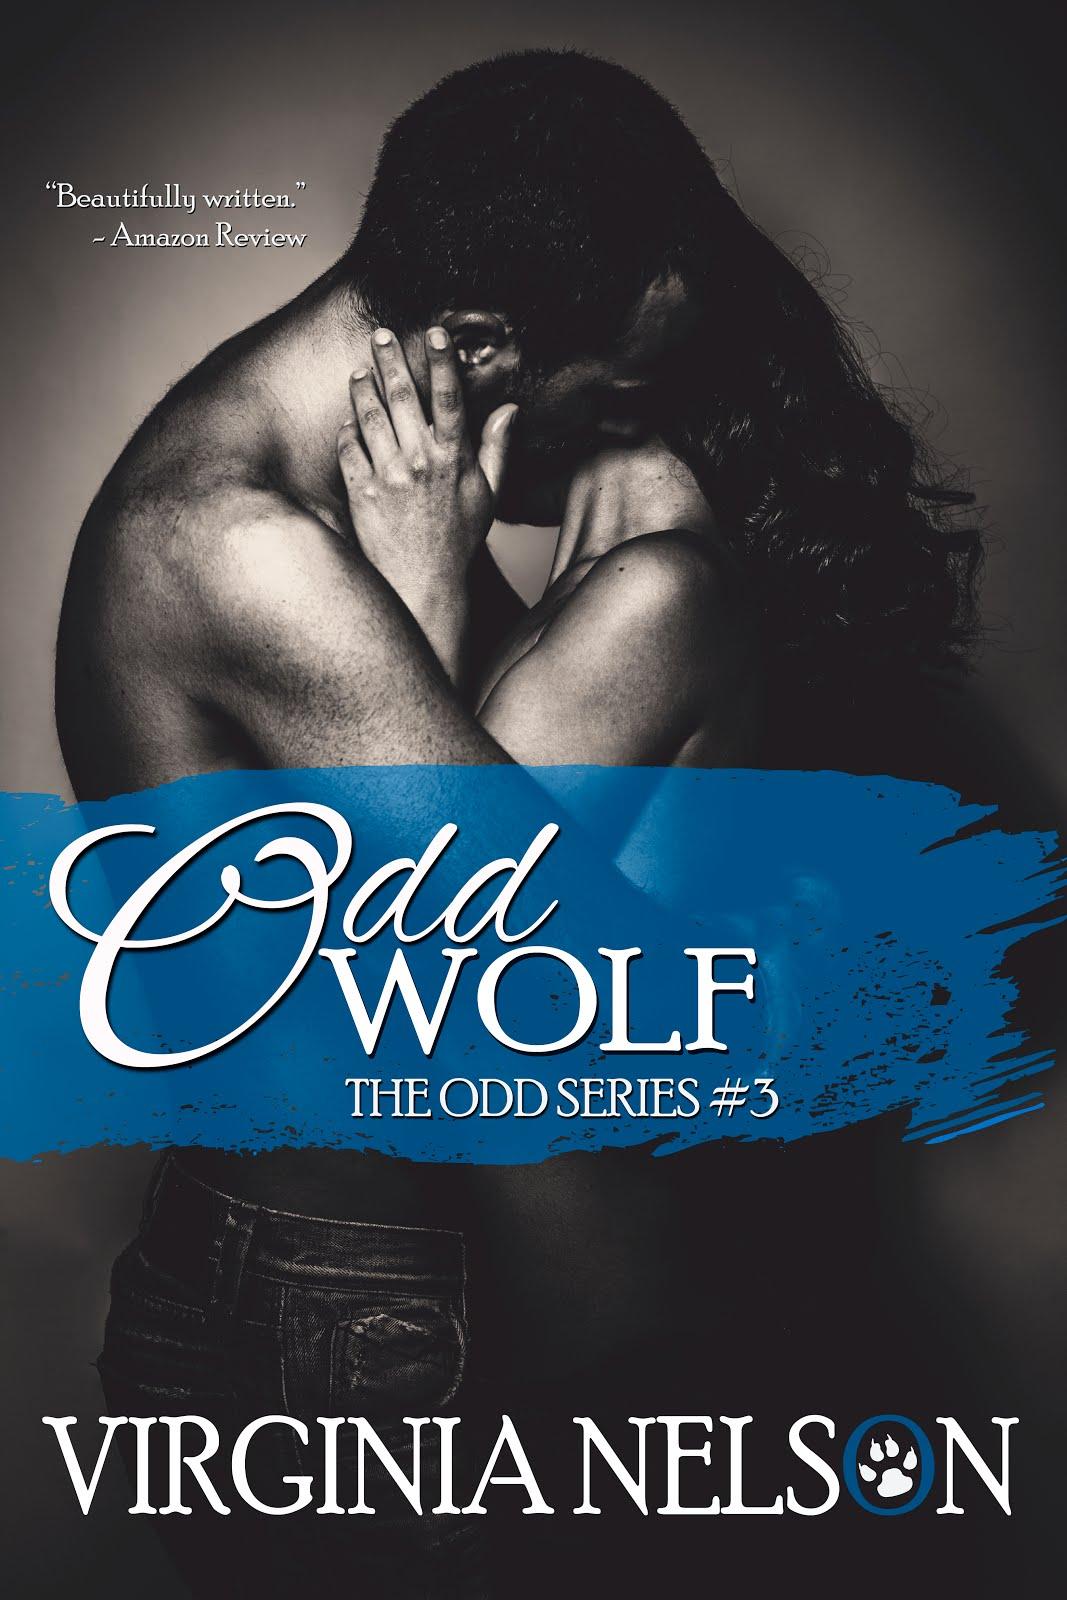 The Odd Series #3